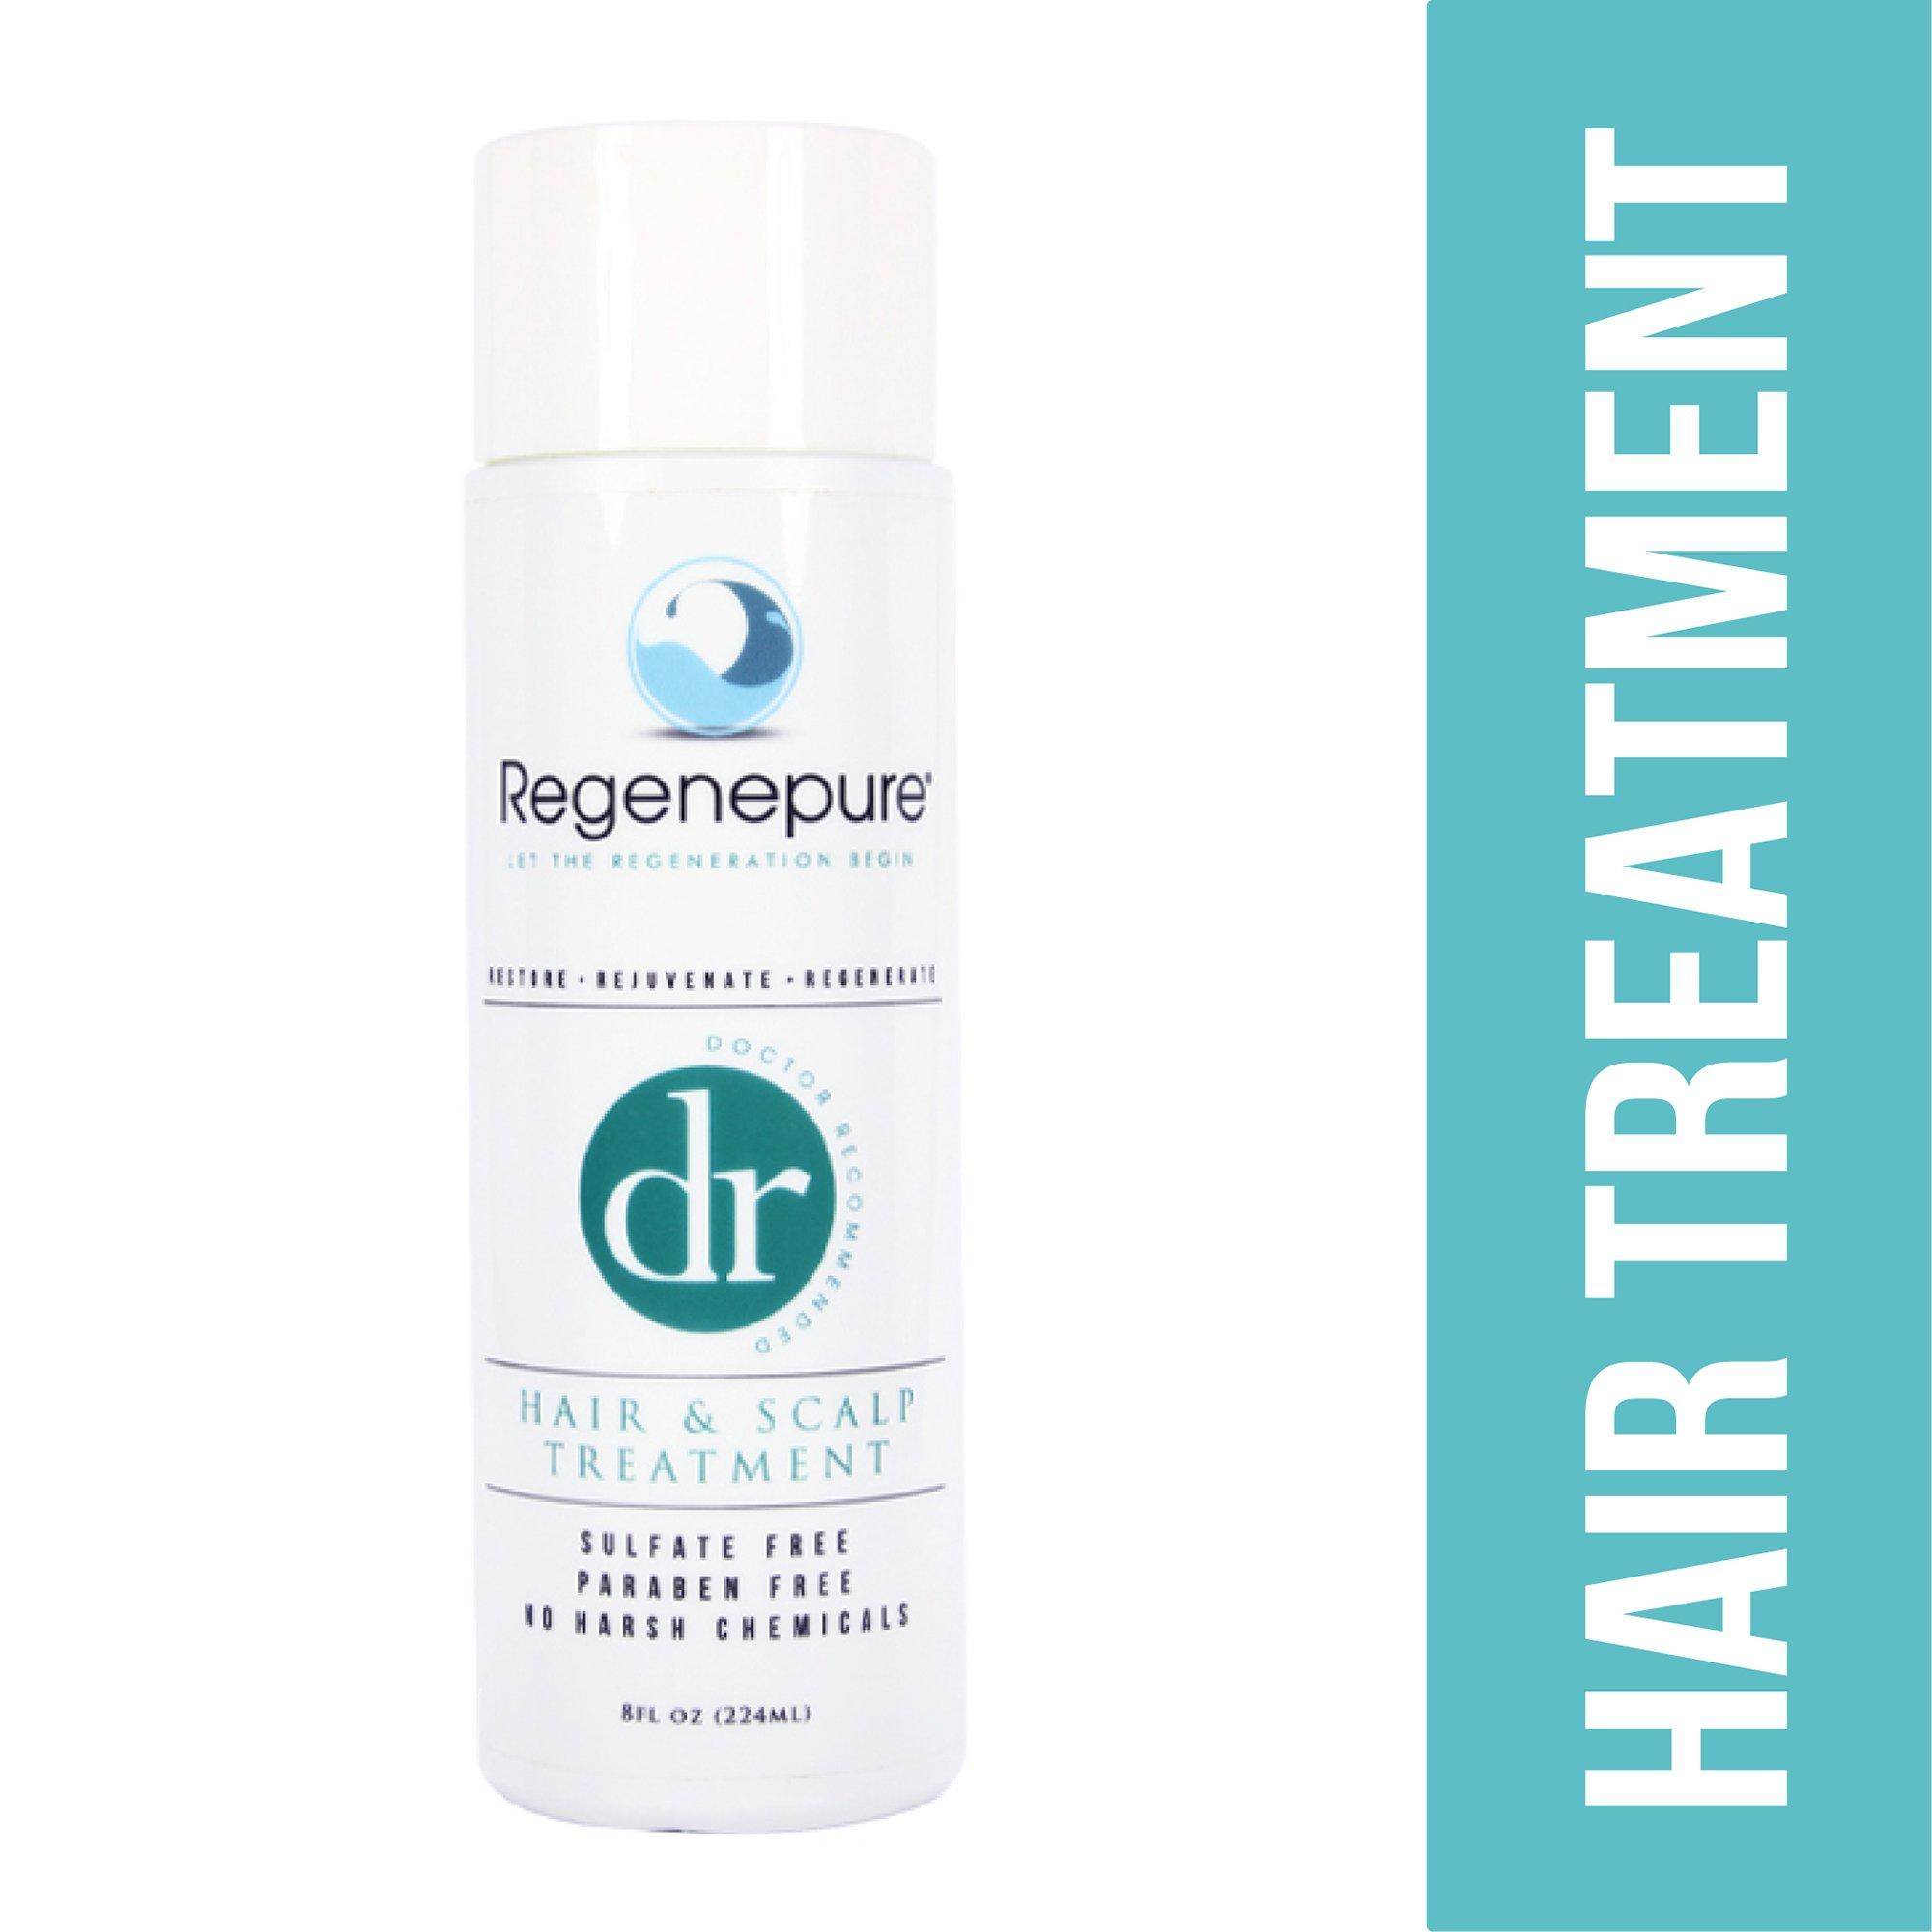 Regenepure - DR Shampoo, Hair and Scalp Treatment, Supports Hair Growth, 8 ounces